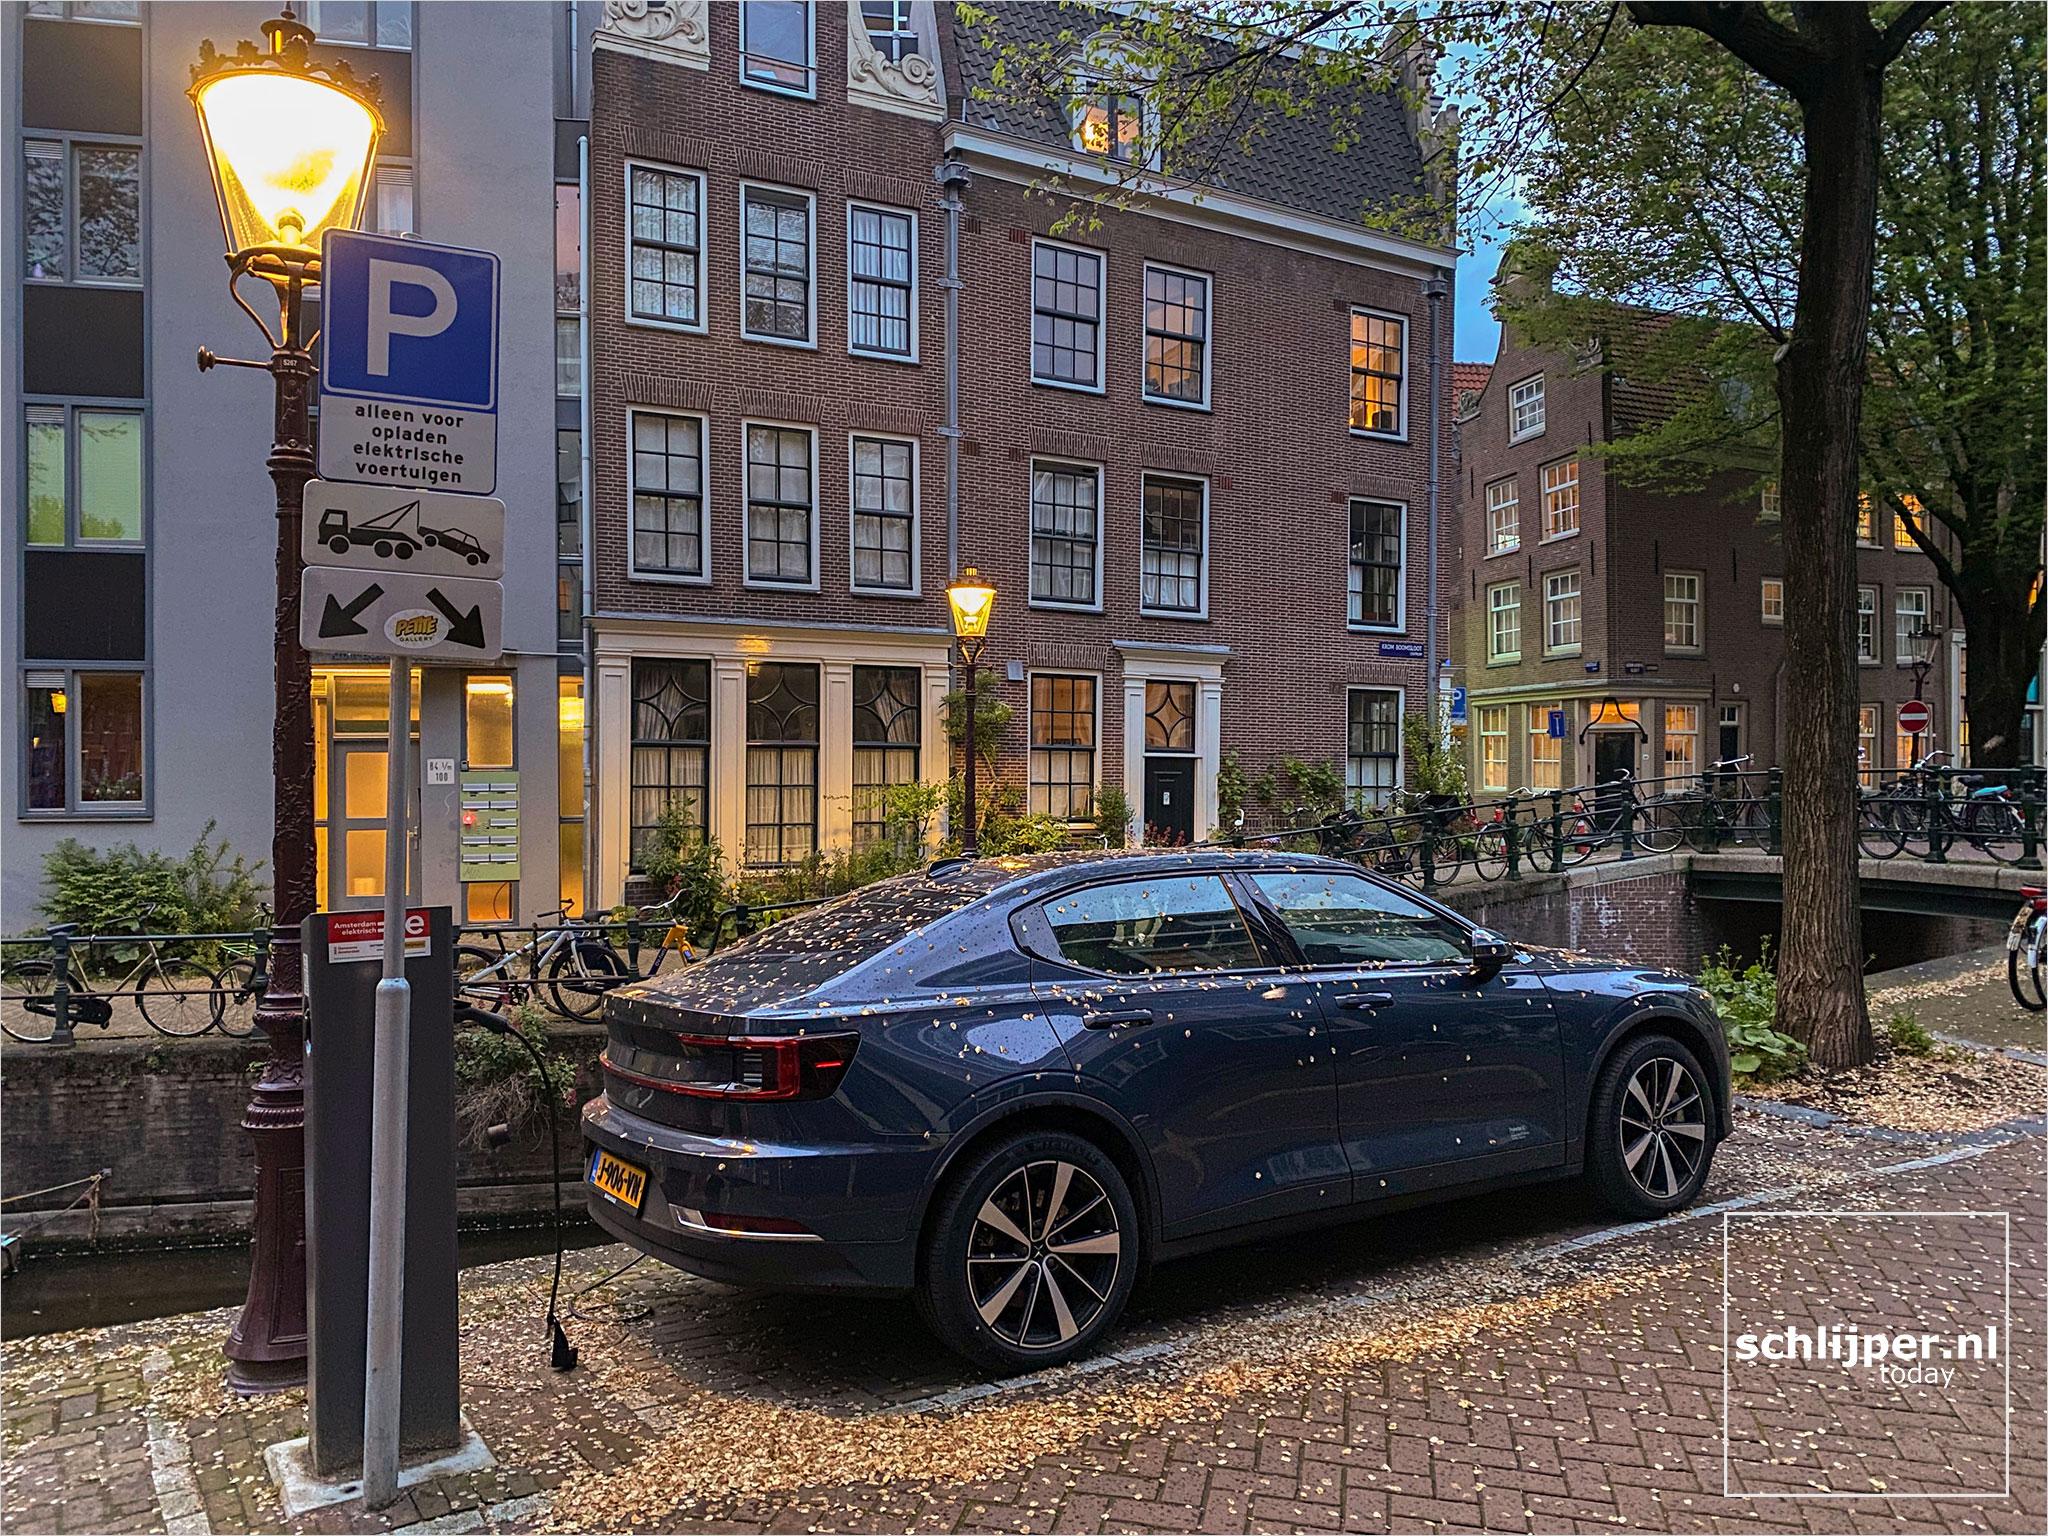 The Netherlands, Amsterdam, 20 mei 2021